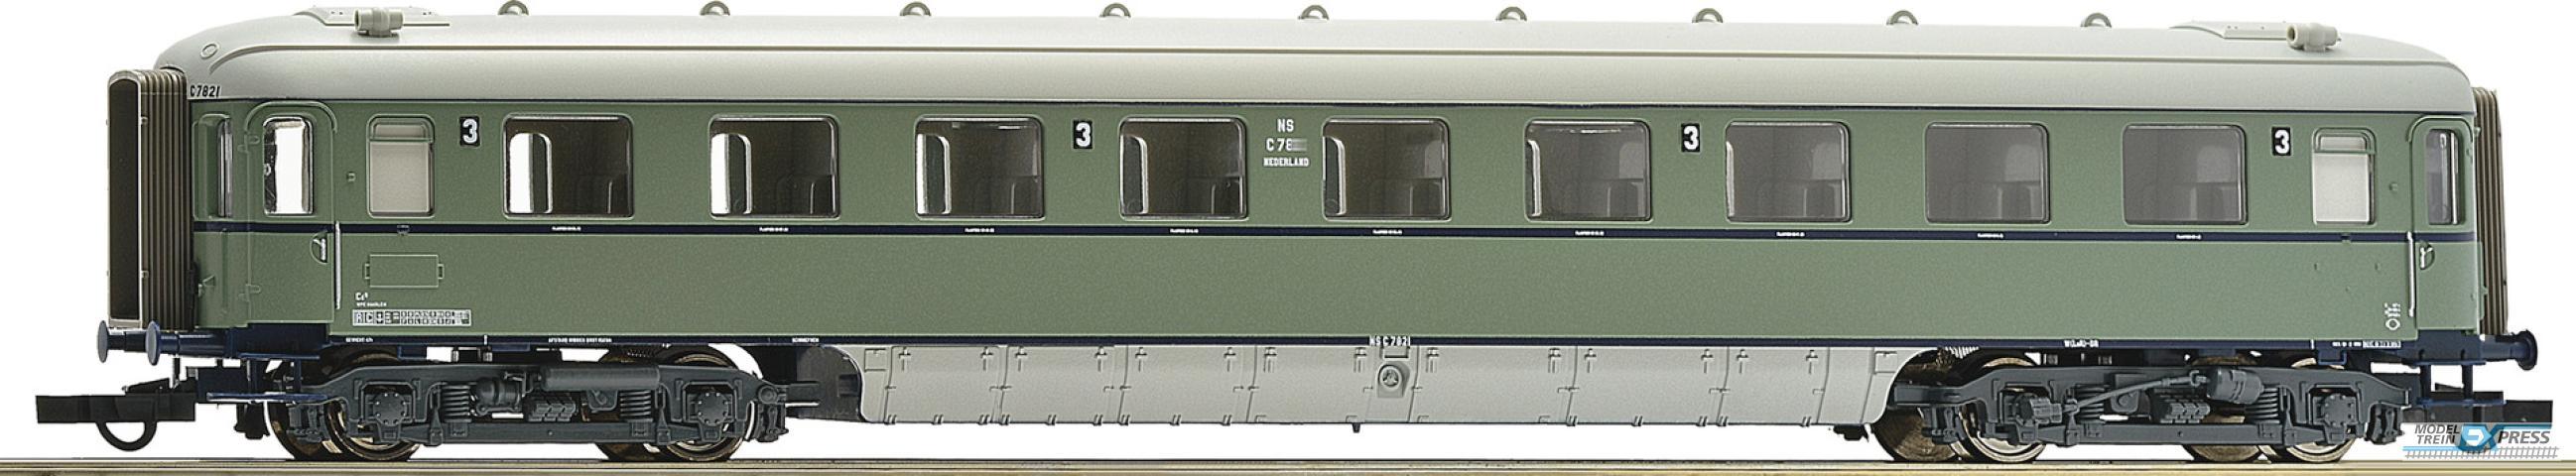 Roco 64998